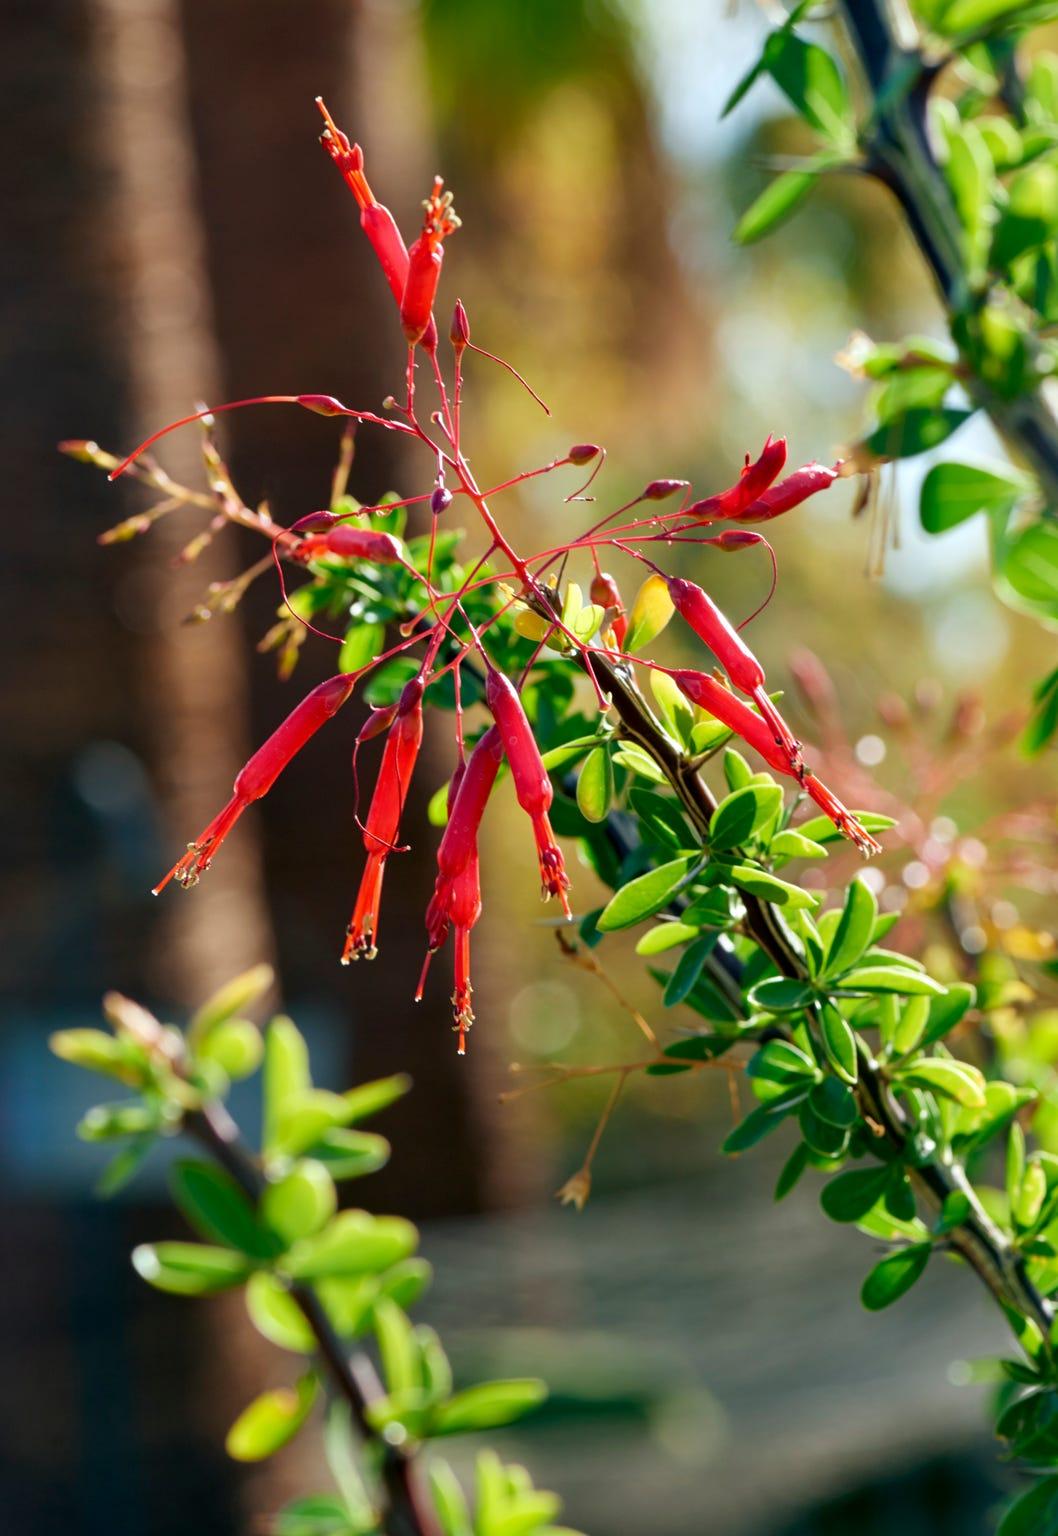 A flower in Palm Springs photographer Gary Dorothy's backyard garden